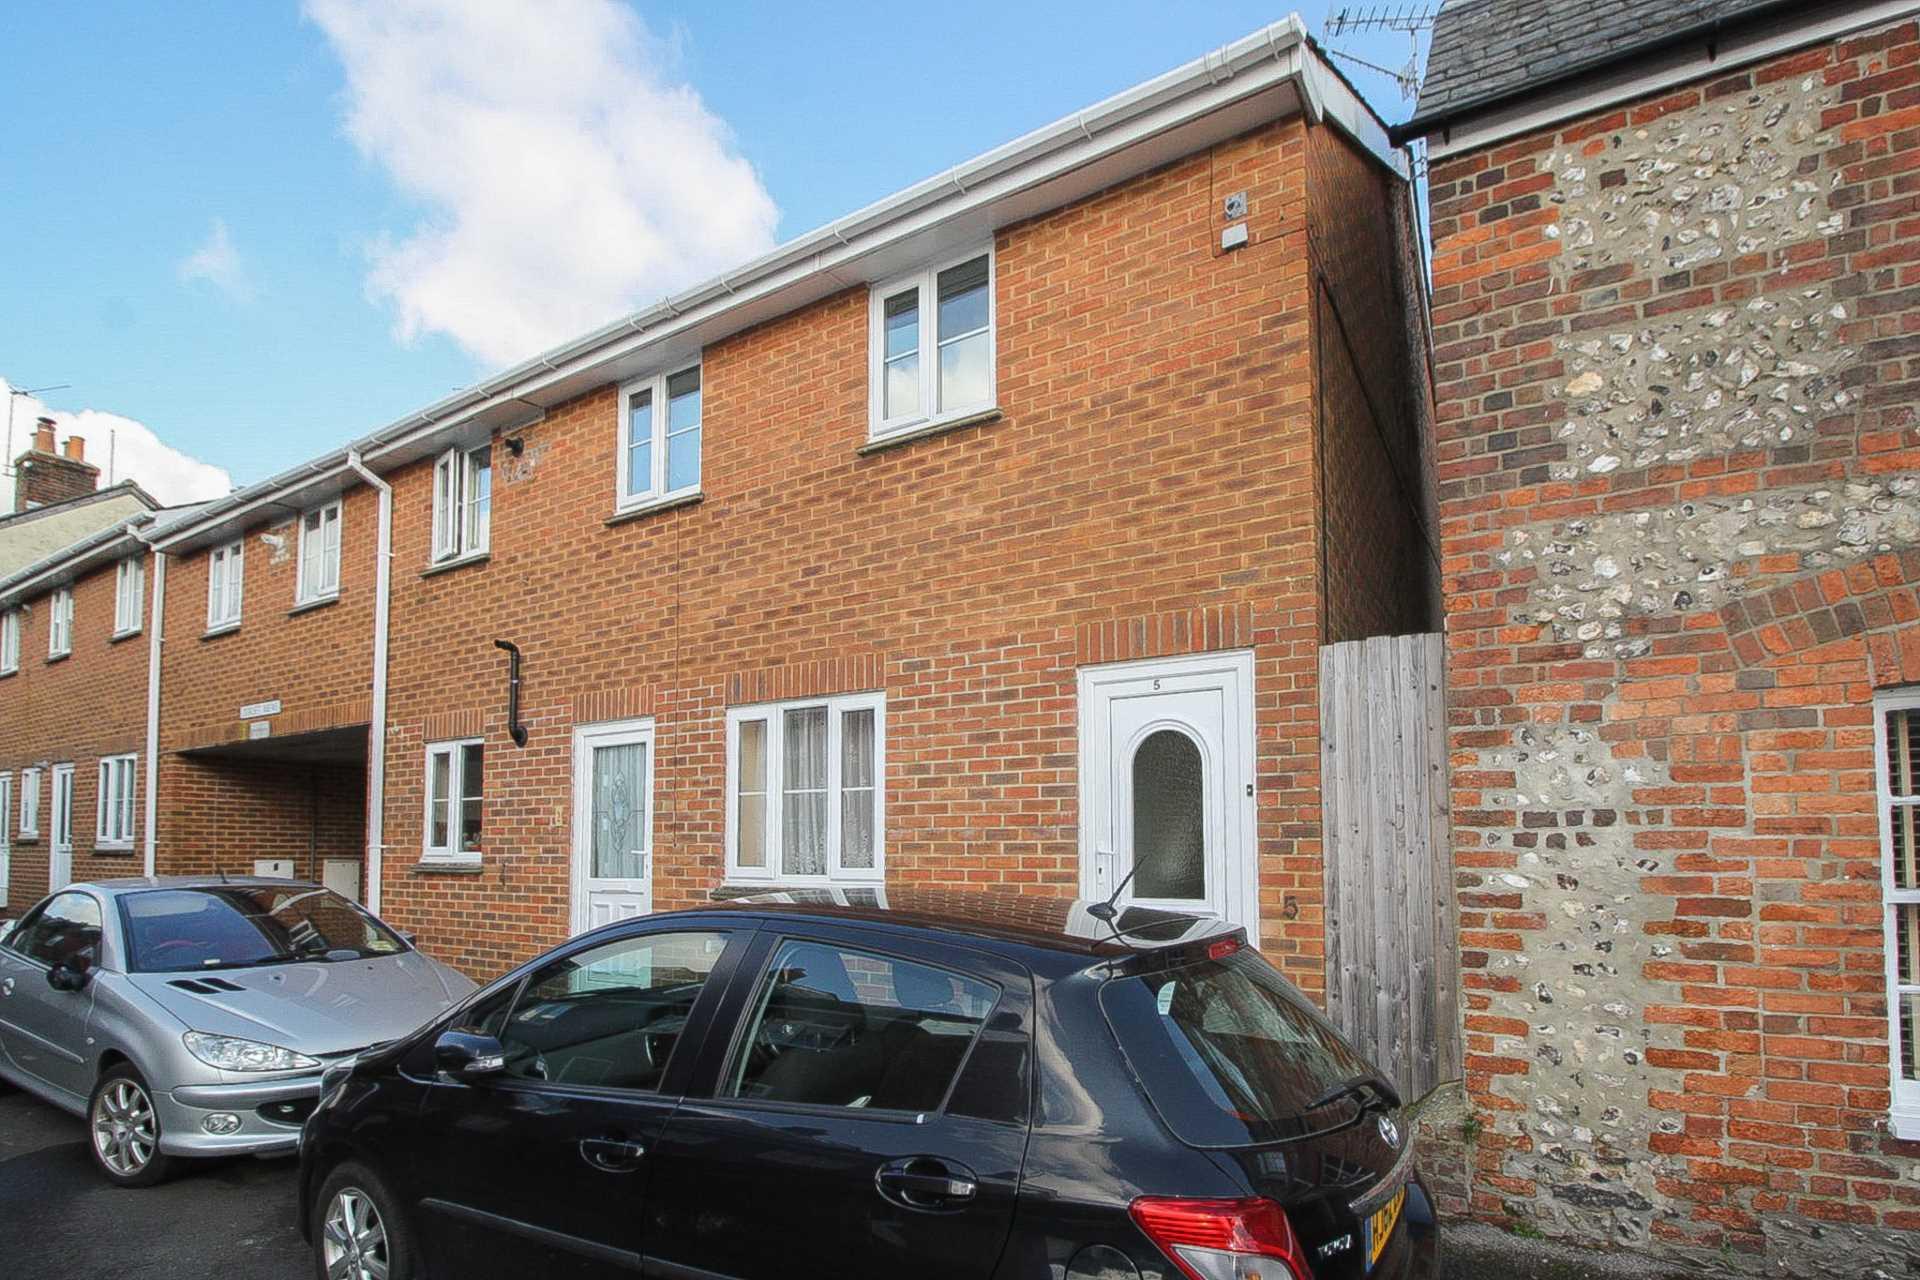 2 bed flat for sale in Dorset Mews, Dorset Street, Blandford Forum - Property Image 1